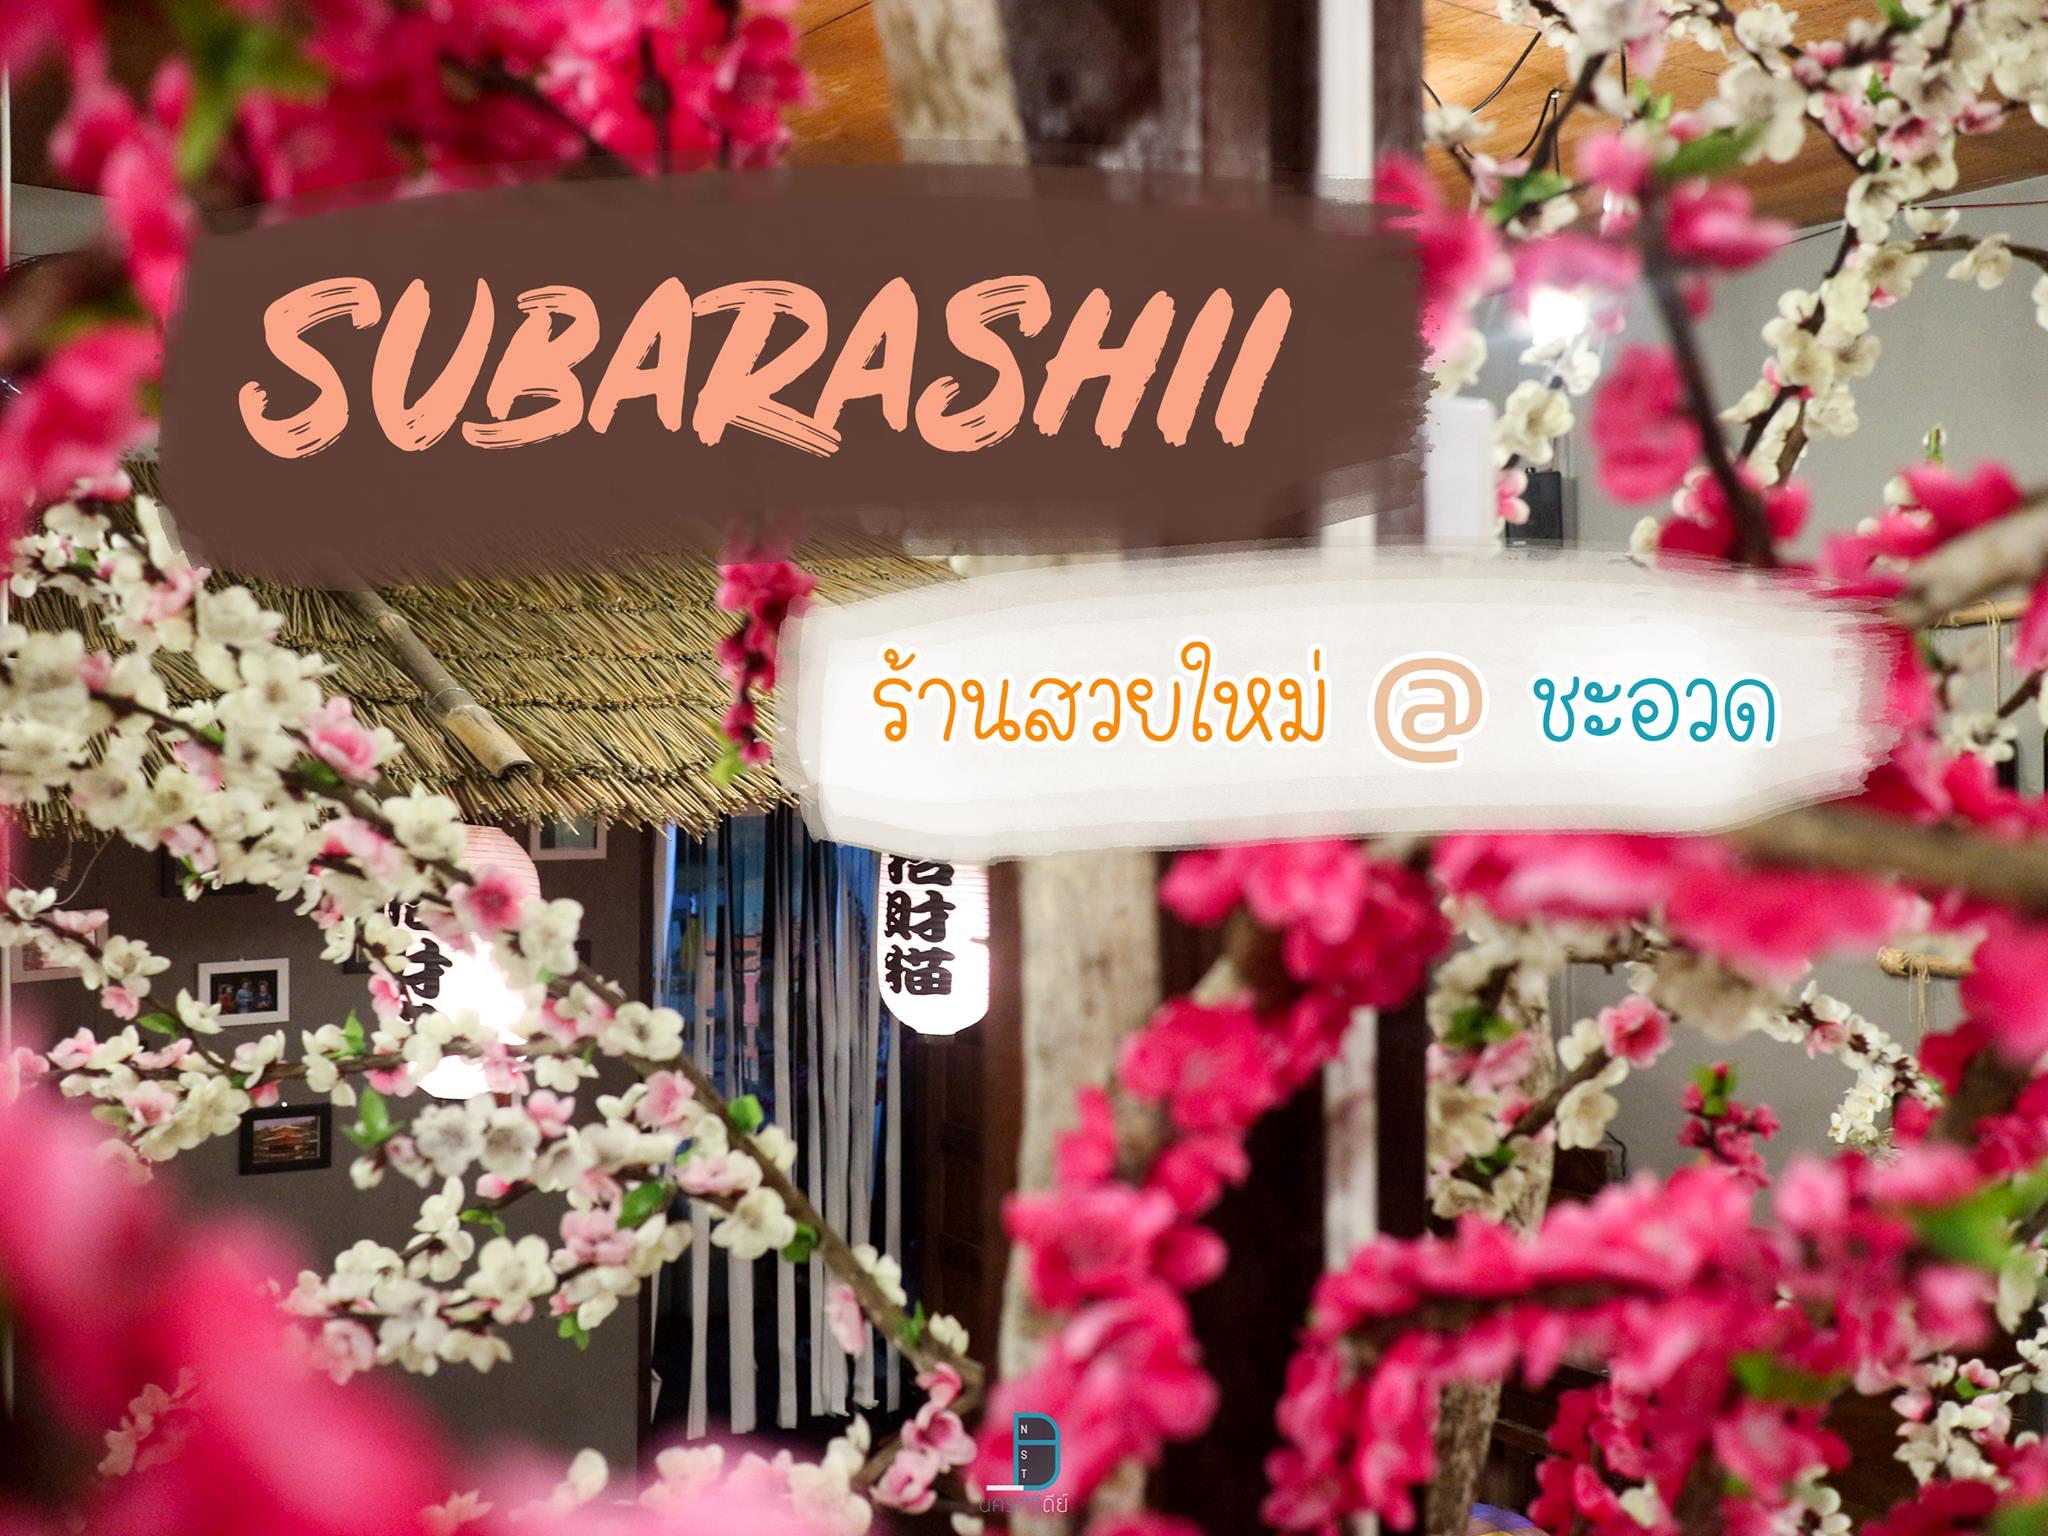 Subarashii ซูบาราชิ ร้านชาบู หม้อไฟเกาหลี เปิดใหม่ ชะอวด นครศรีธรรมราช